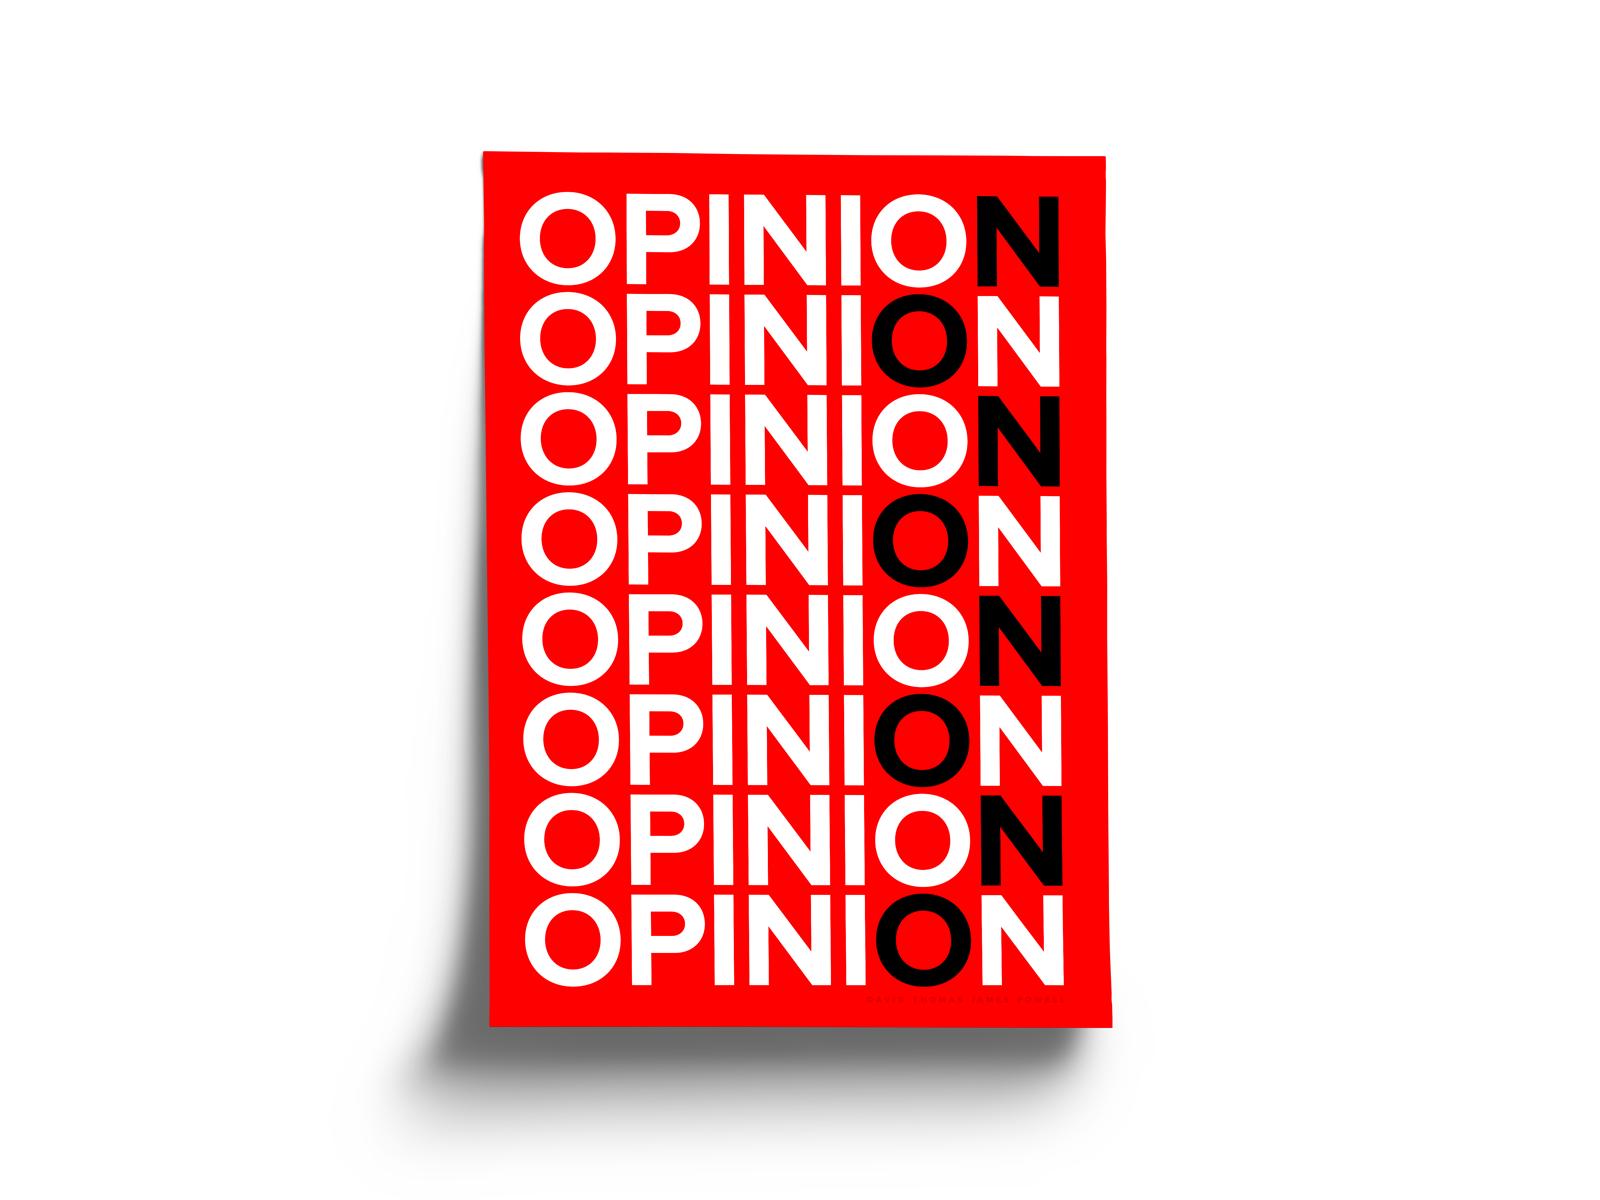 Opinion_1600